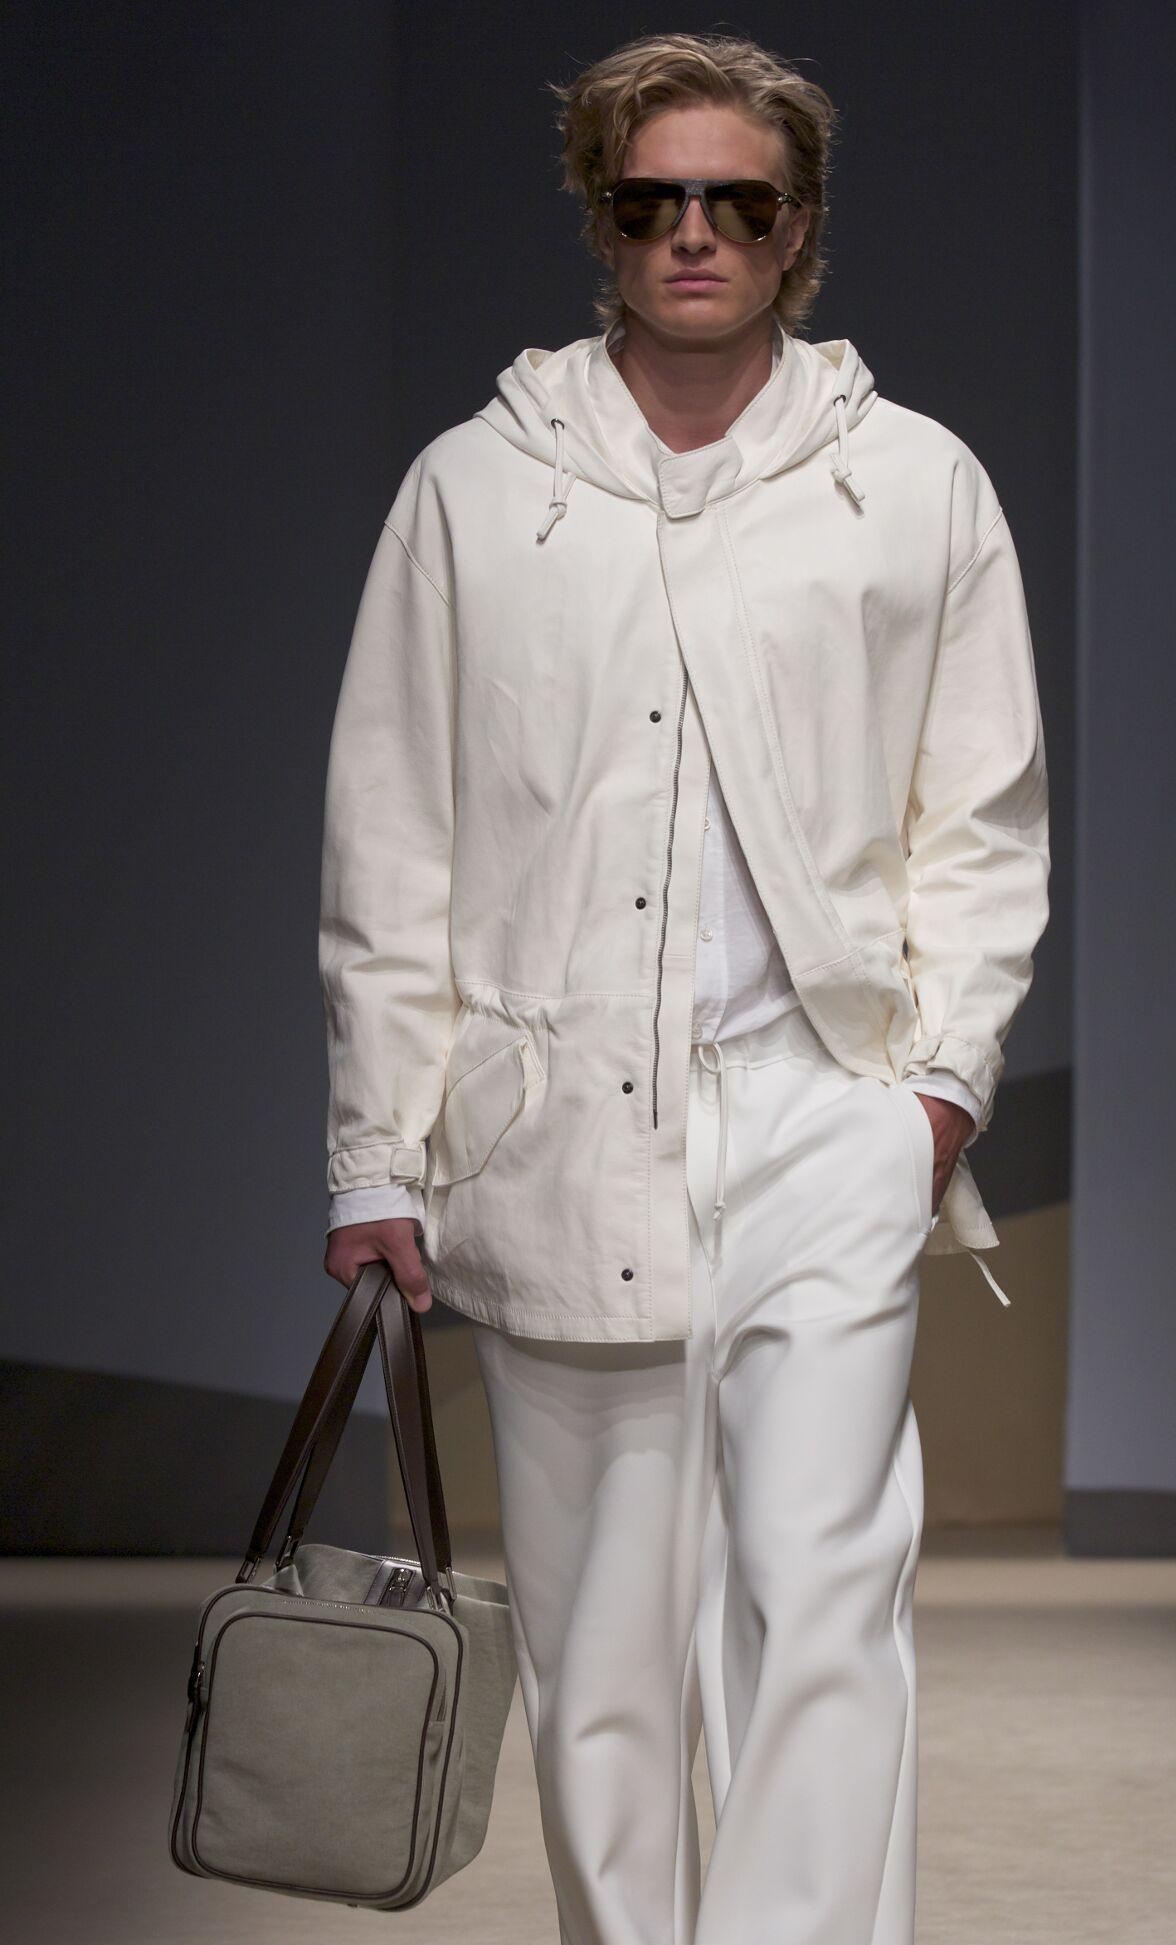 Trussardi Men's Collection 2014